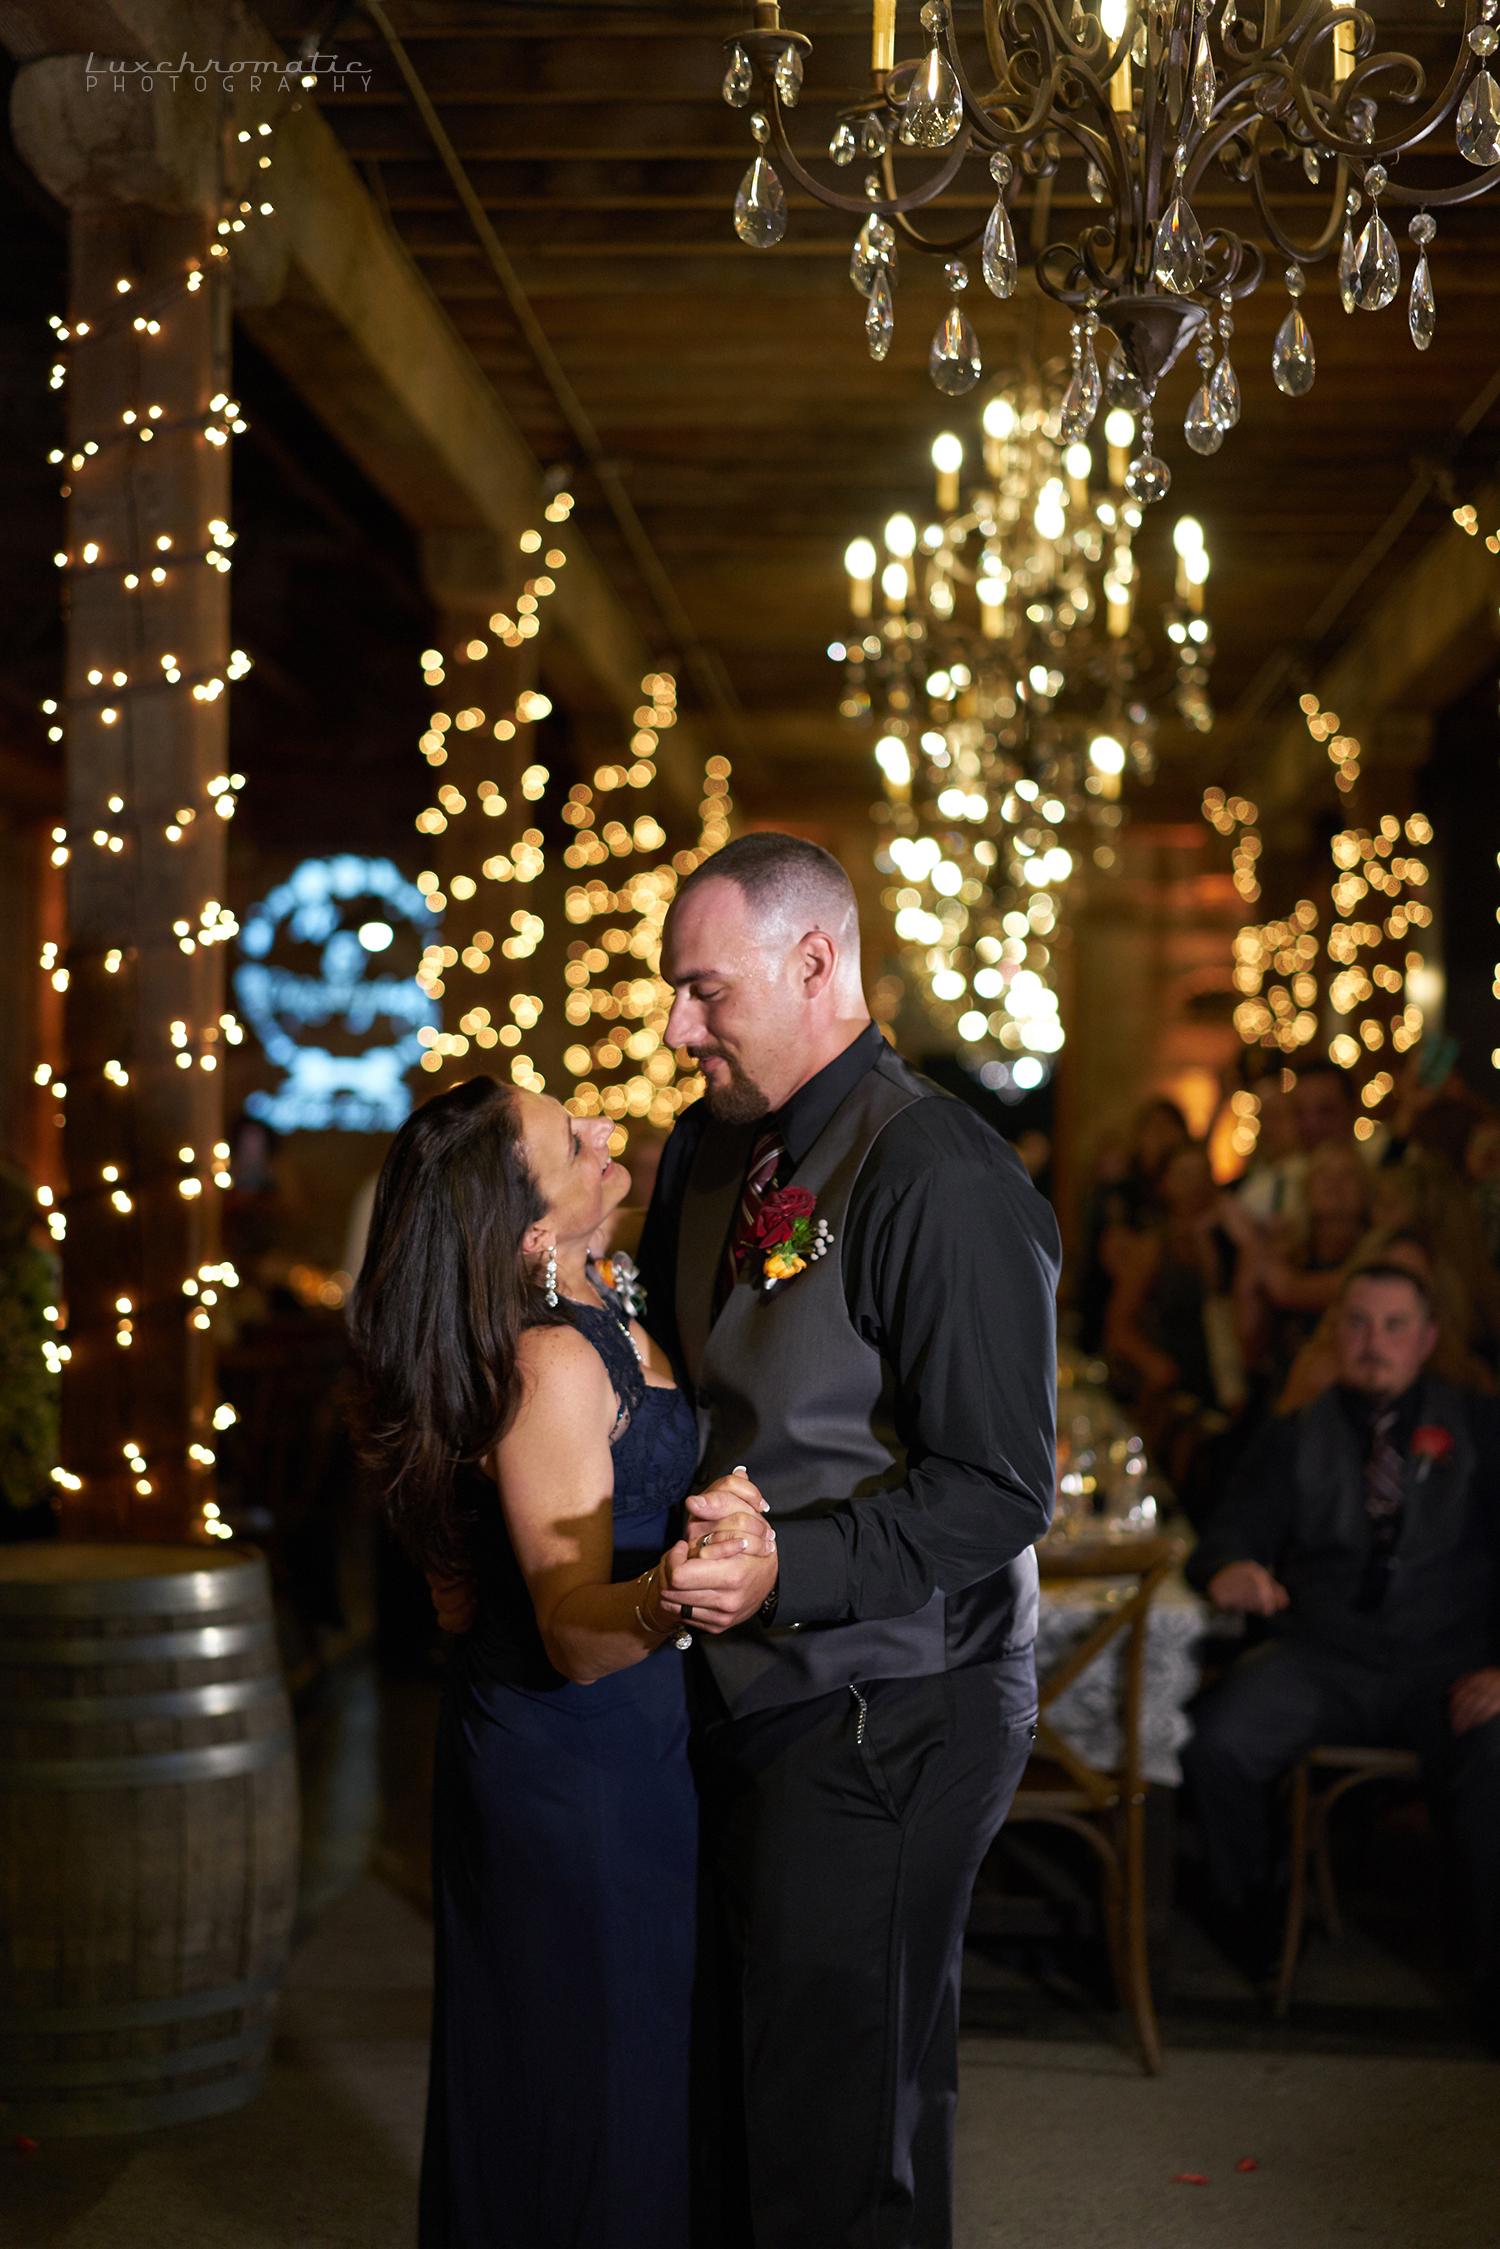 081217_Rachel_Chris_a1050-weddingdress-bride-weddingphotography-weddingphotographer-bridal-groom-wedding-engagementring-proposal-brides-diamondring-sonyalpha-sony-sonya9-sonya7rii-sanfrancisco-sf-bayarea-photographer-profoto-murrietas-well.jpg